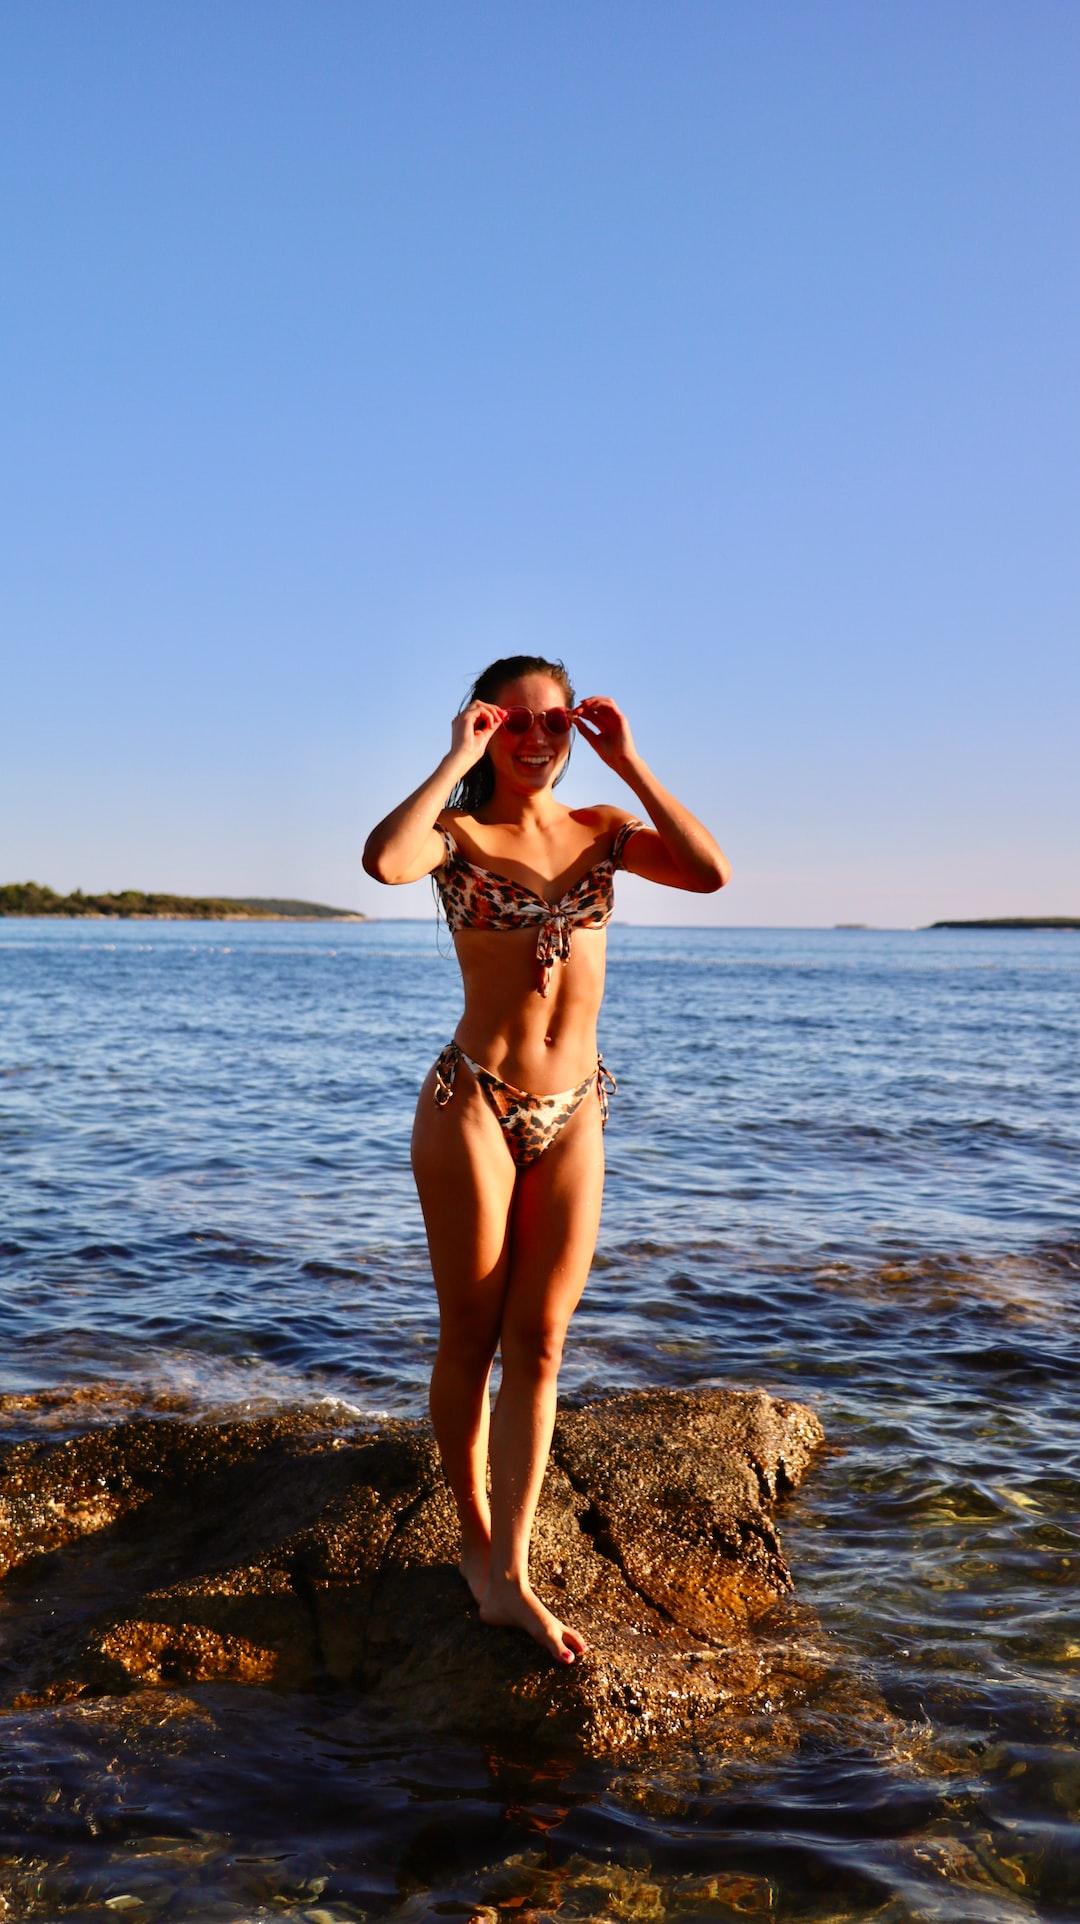 Cum on beach girl